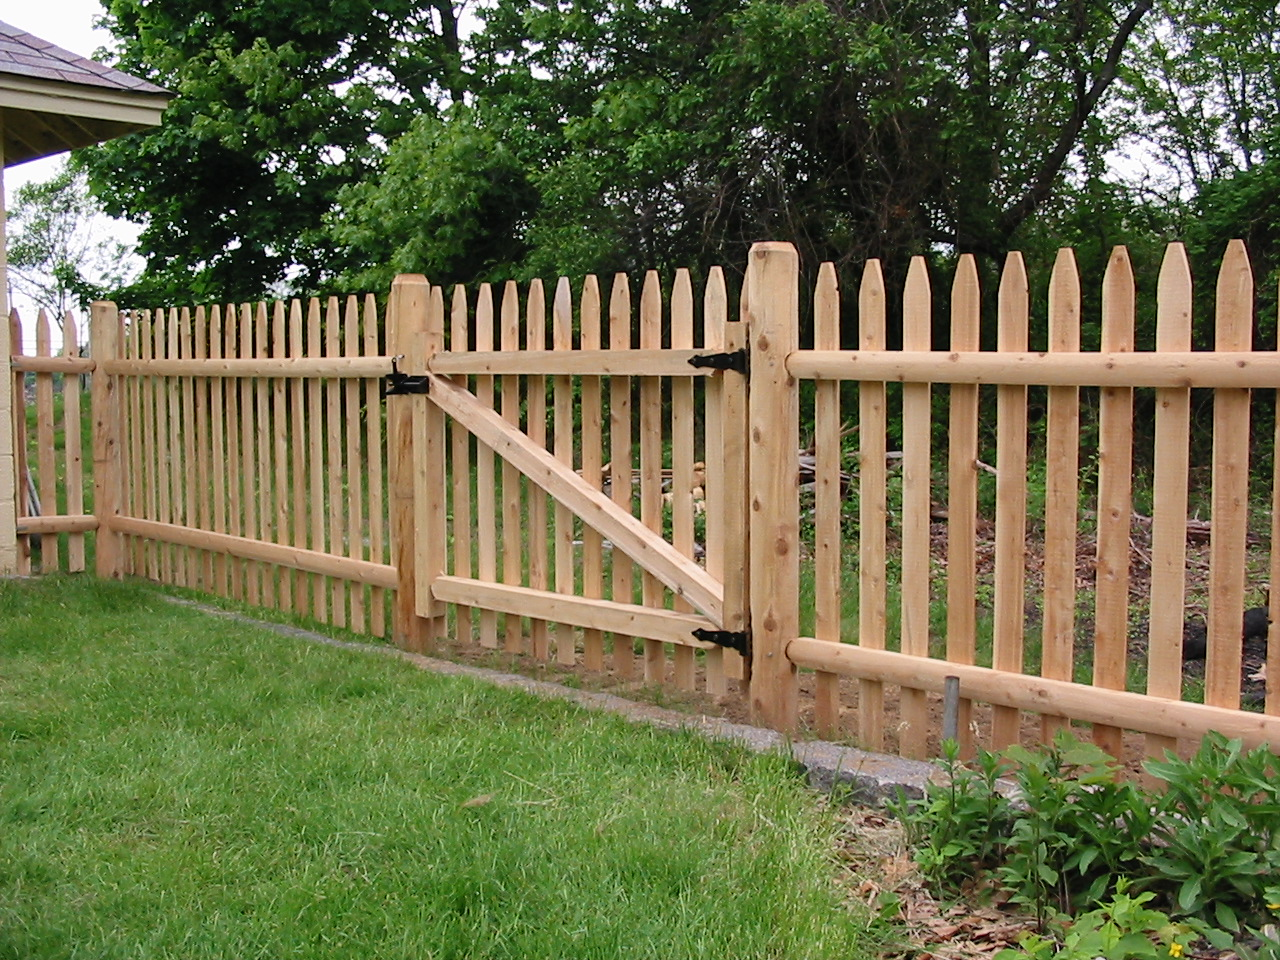 Backyard Fencing Ideas - HomesFeed on Backyard Wooden Fence Decorating Ideas  id=24845